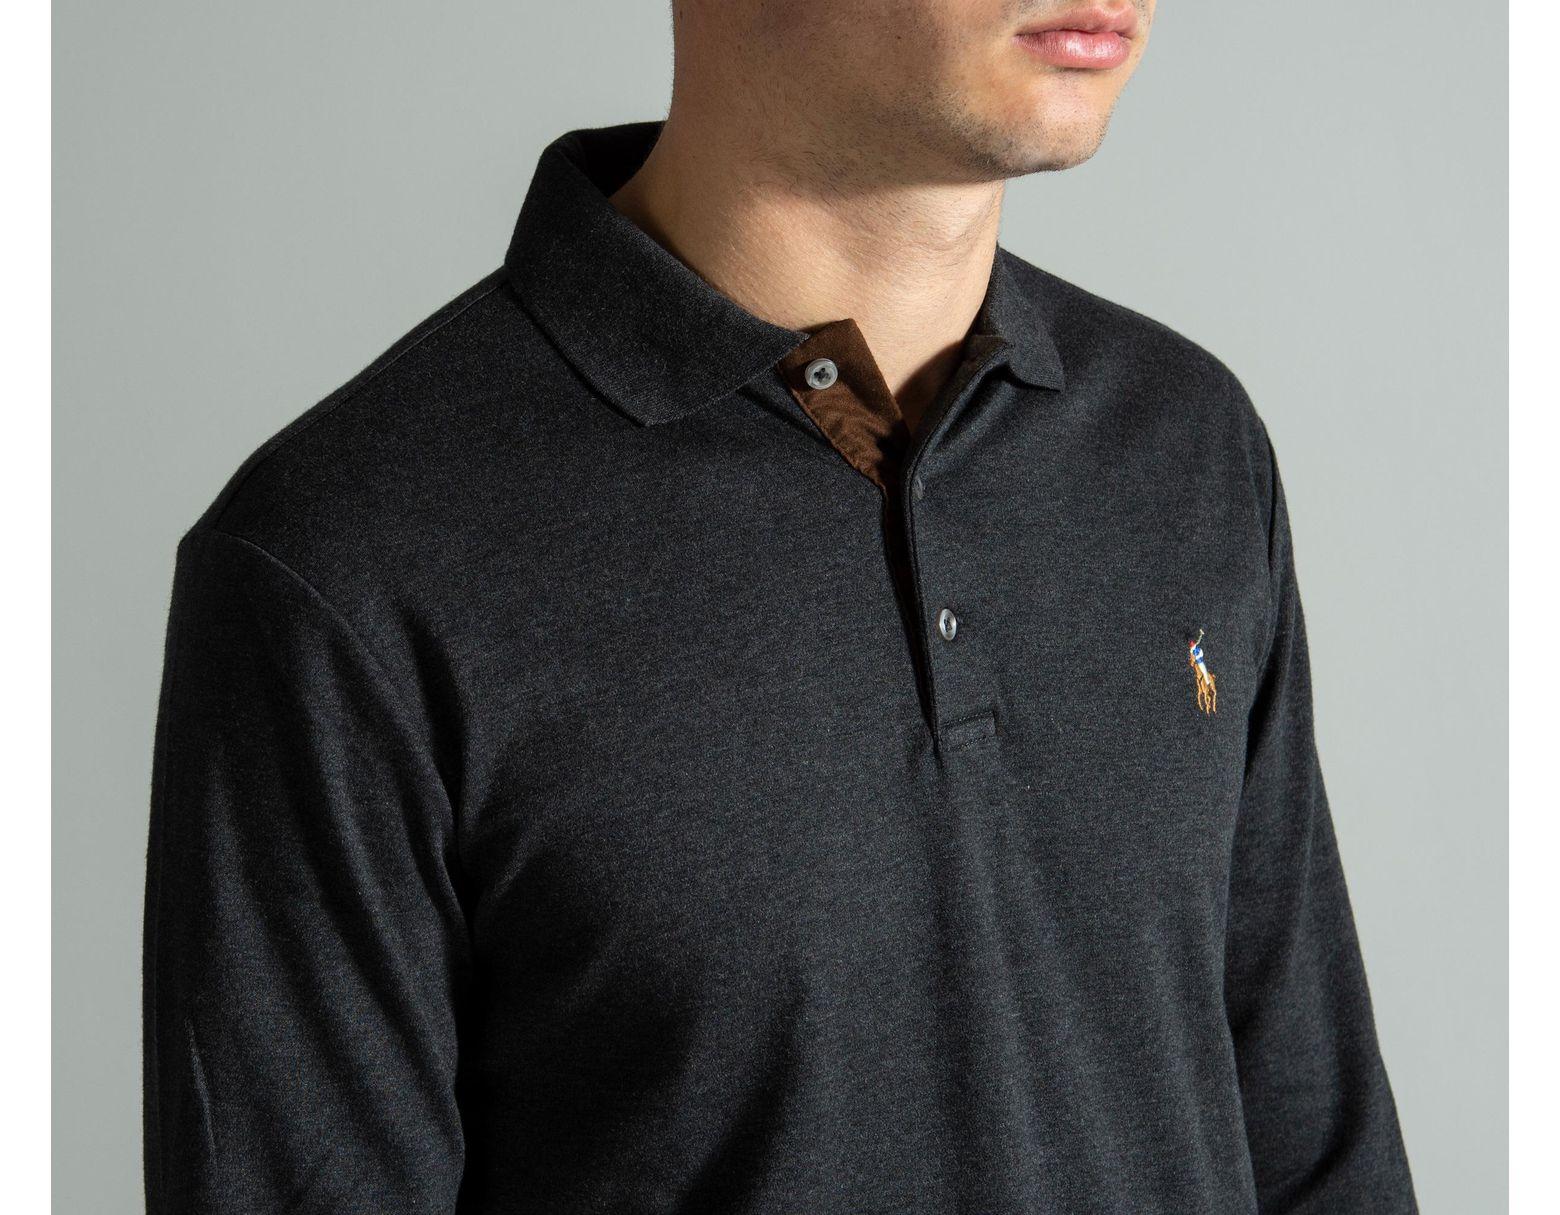 9ebace8c Polo Ralph Lauren Slim Fit Long Sleeved Polo Granite in Black for ...